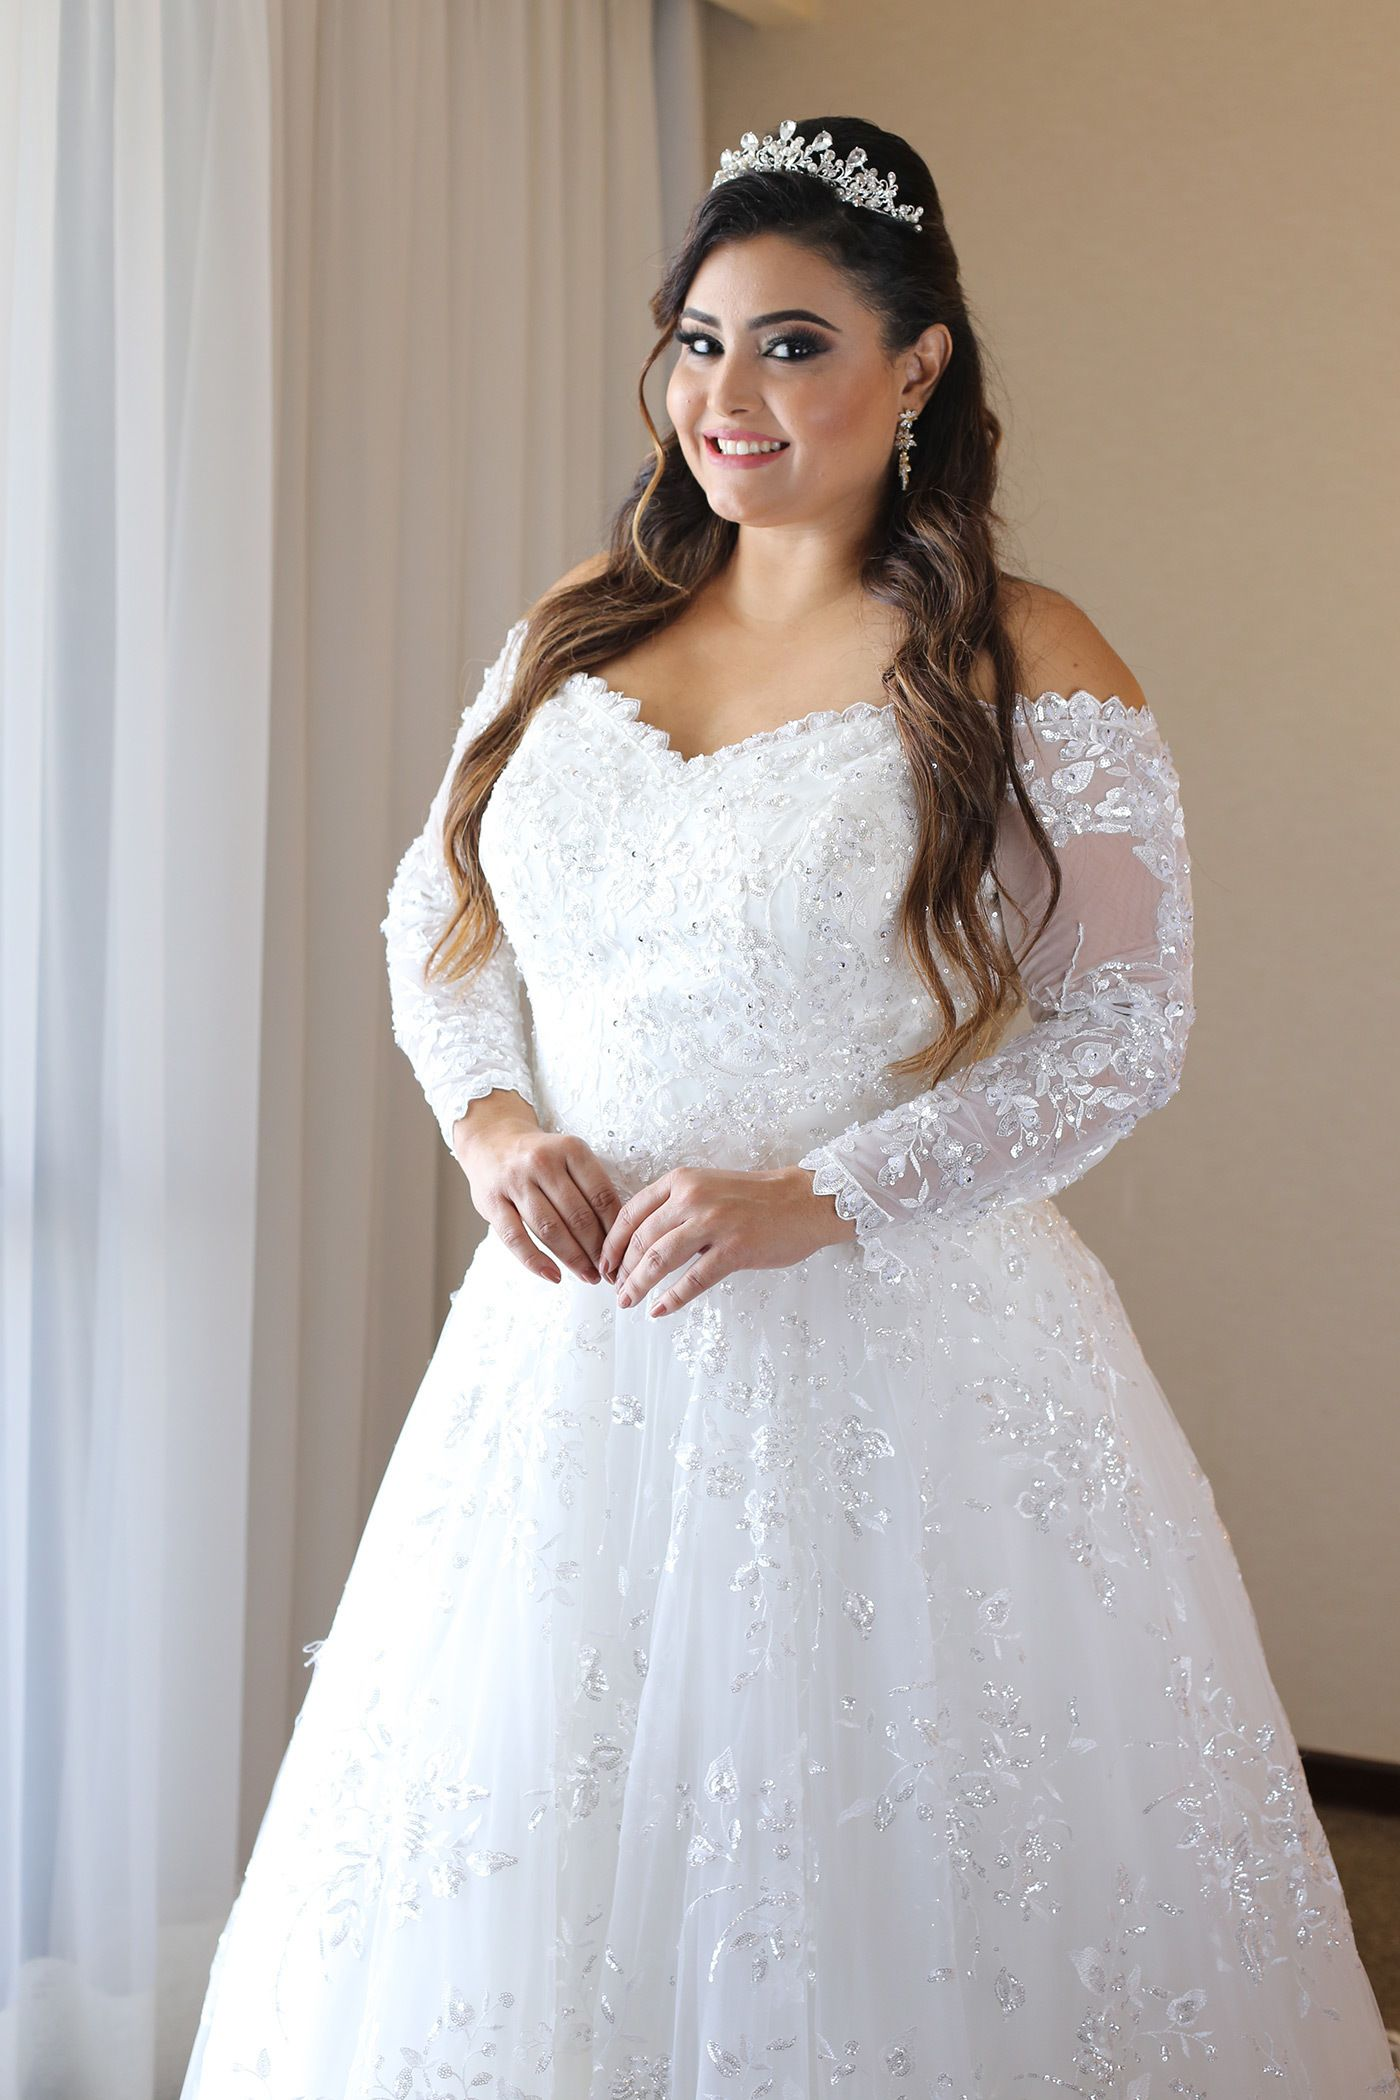 Vera wang plus size wedding dresses  Pin by Angelika Stottan on Brautkleider für mollige  Pinterest